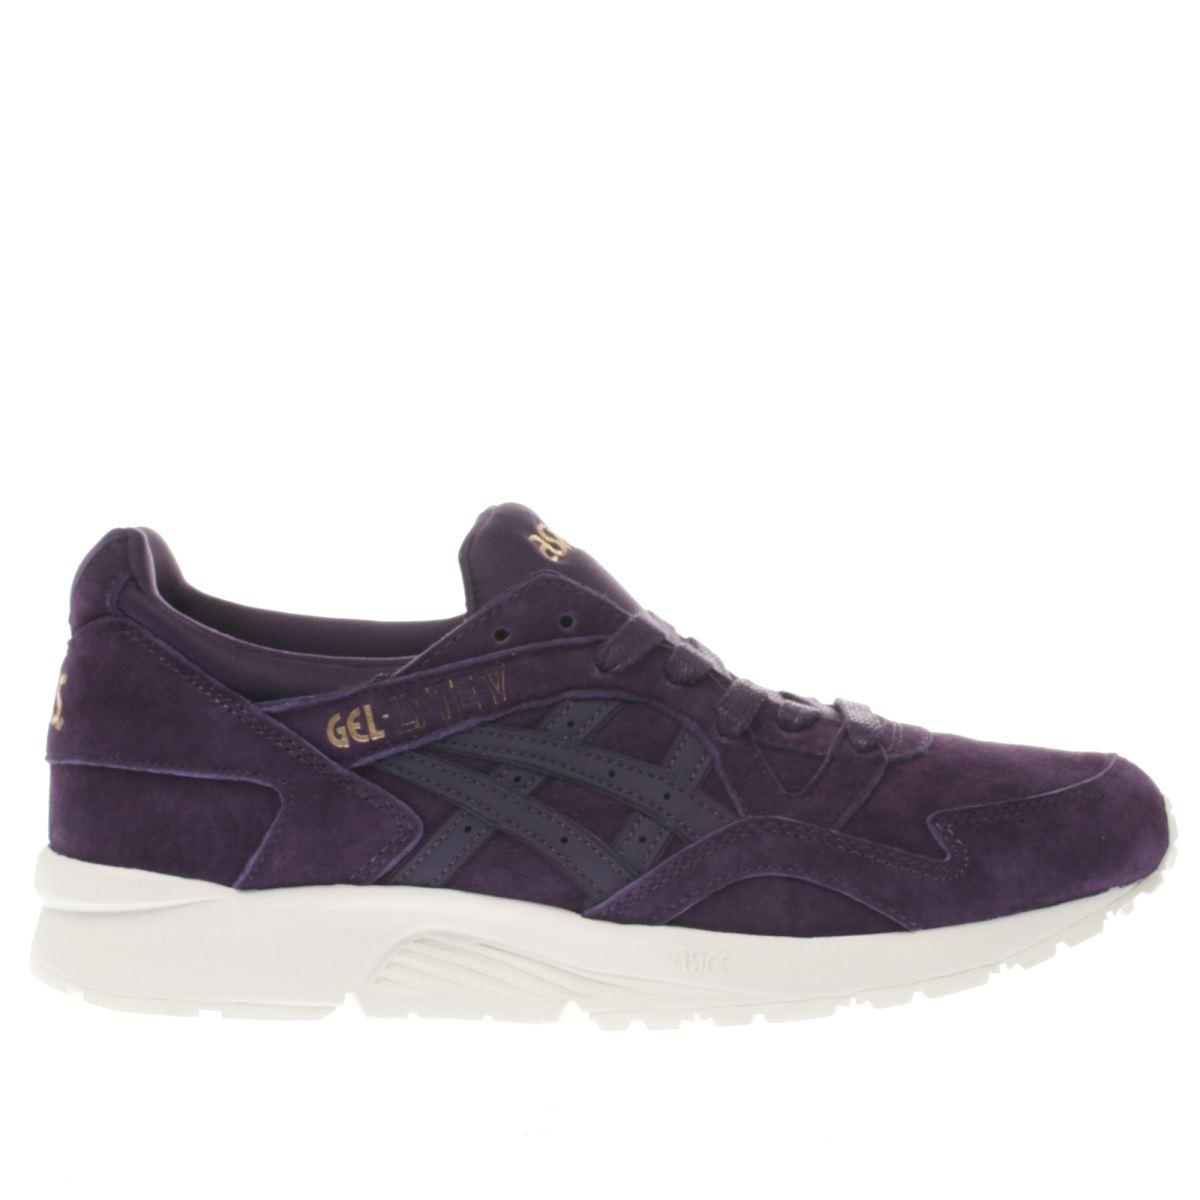 asics dark purple gel-lyte v trainers